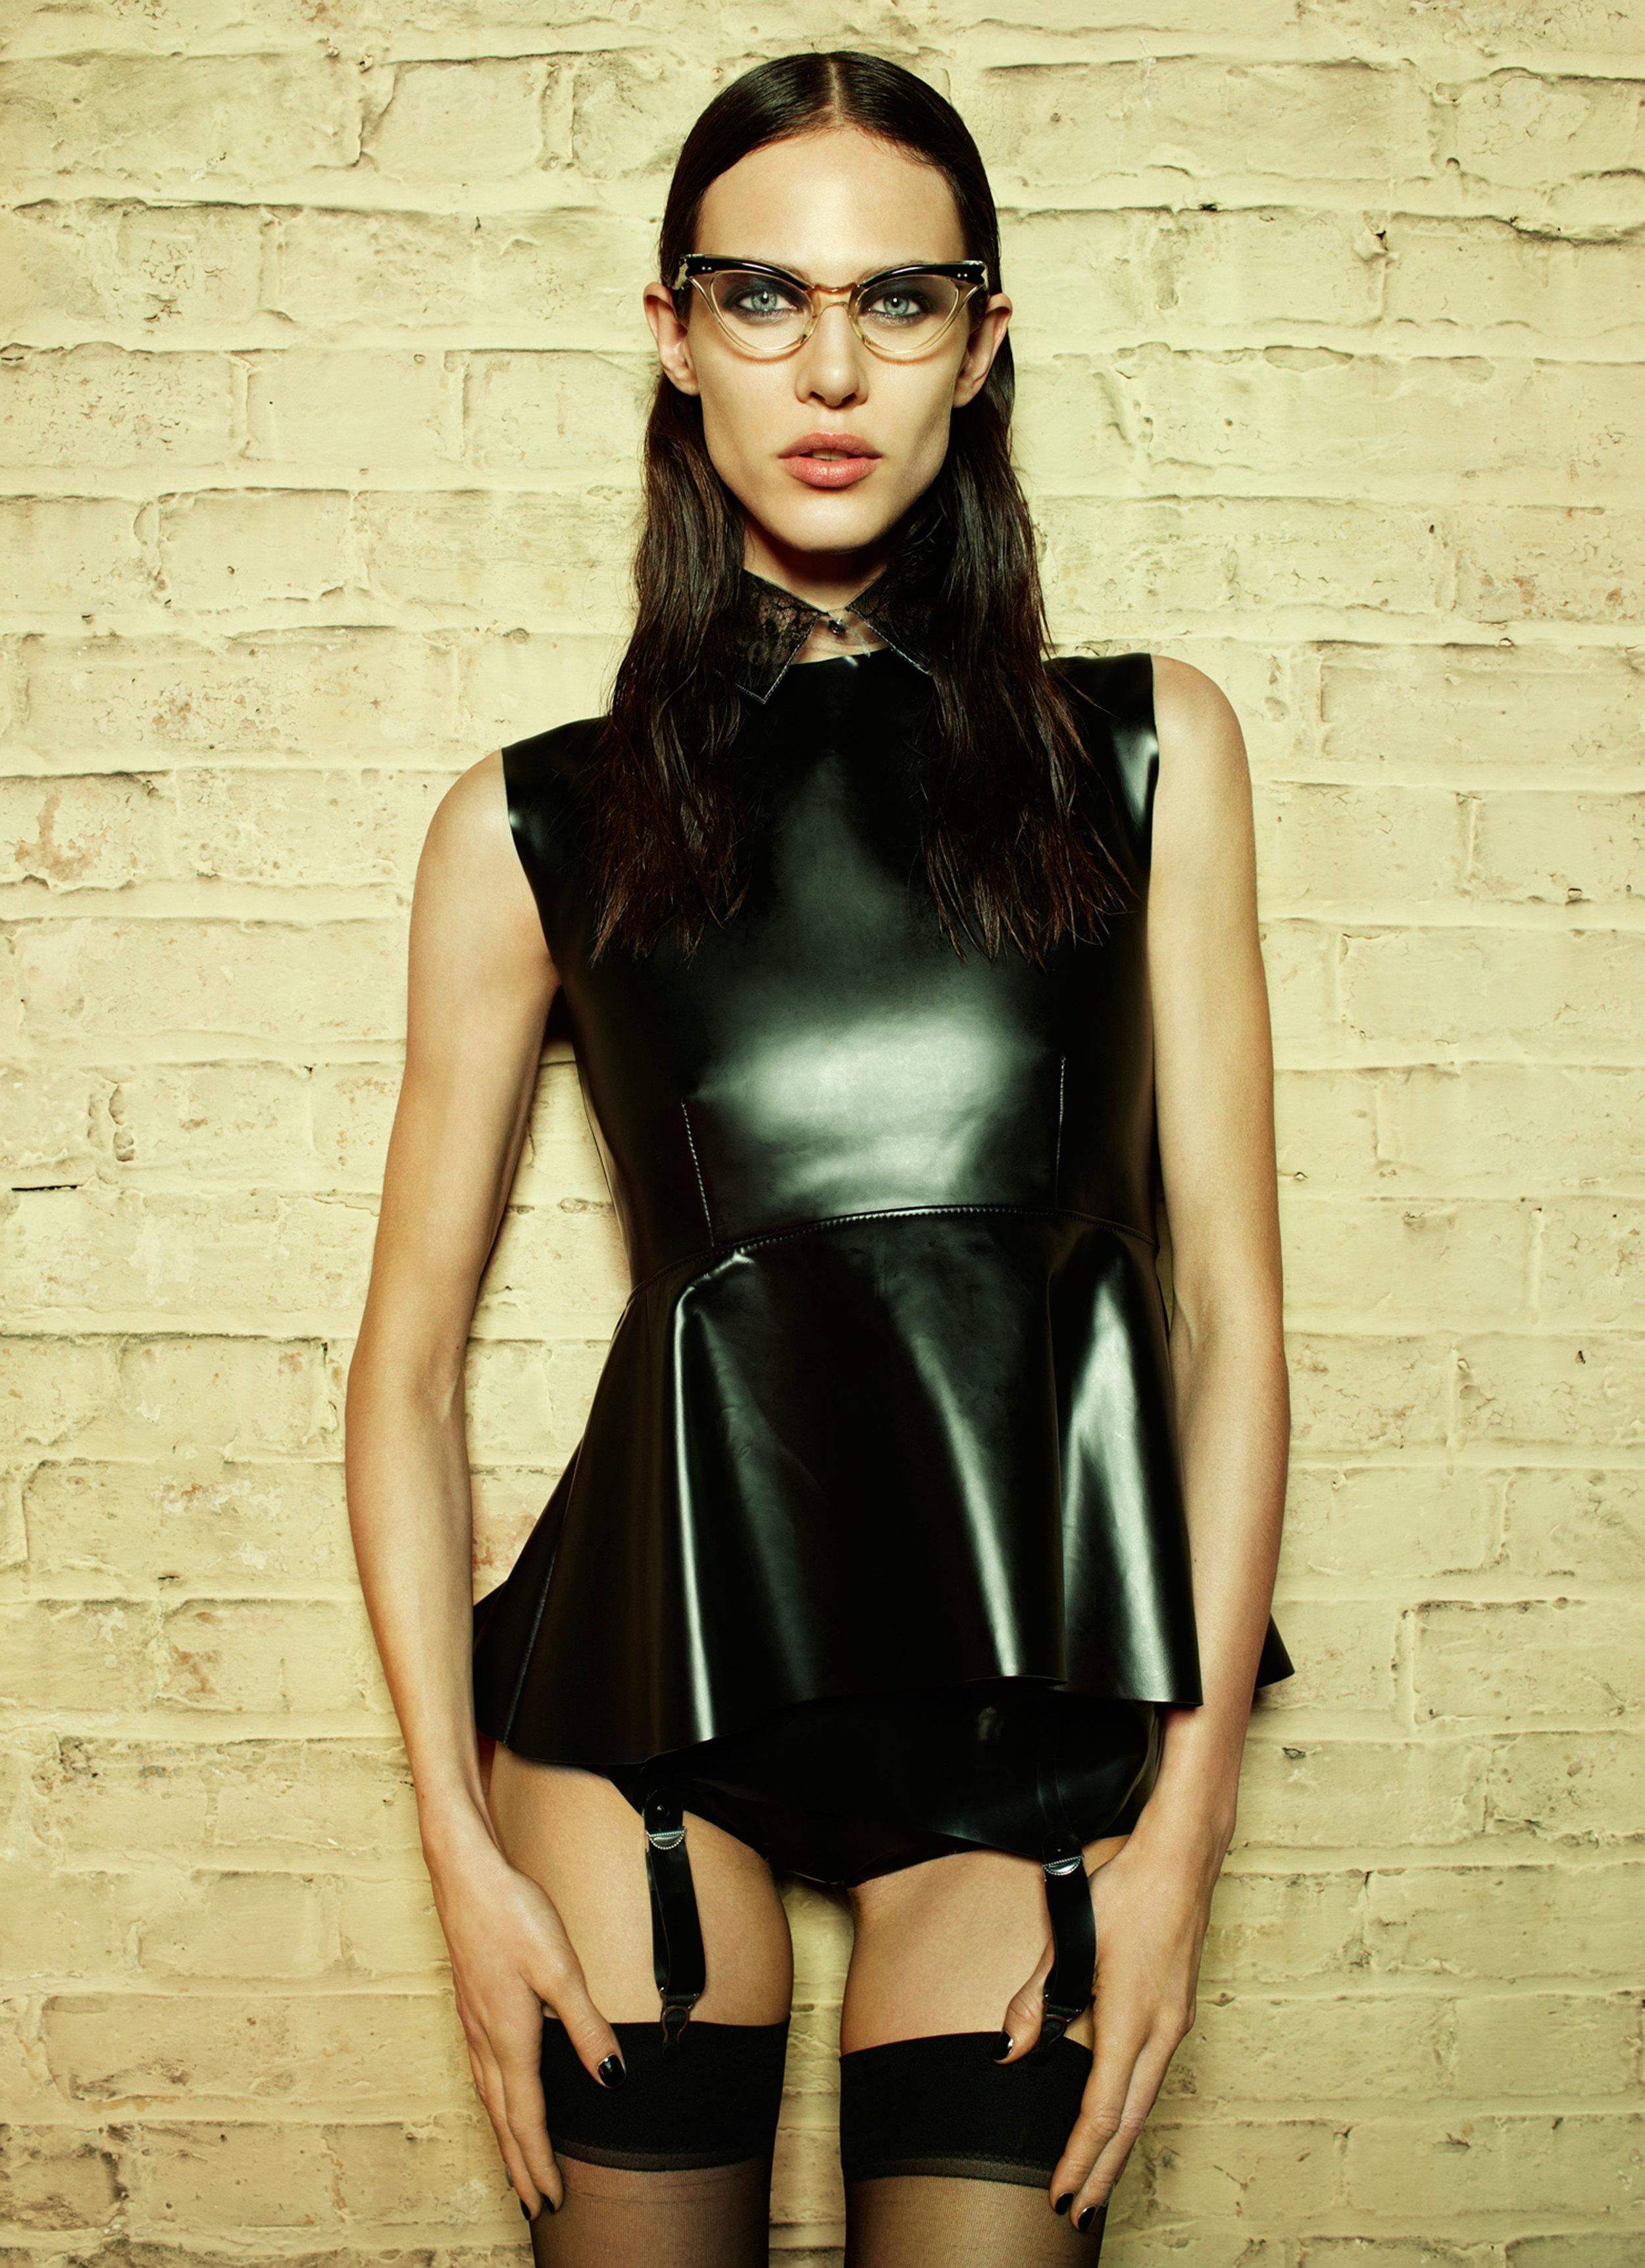 Aymeline_Valade-Emma_Summerton-Fat_Magazine-04-mode.newslicious.jpg